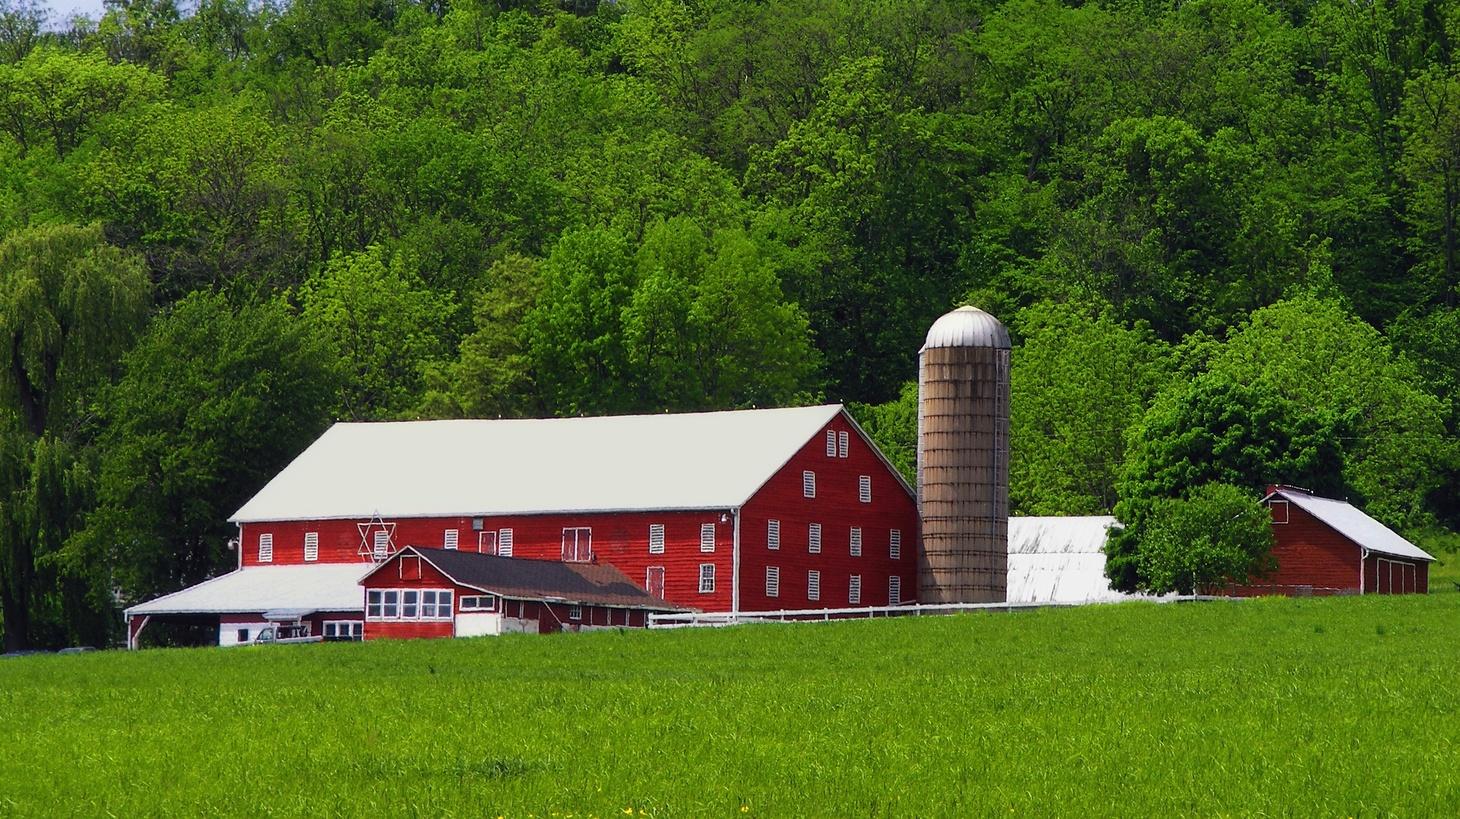 A farmstead in Adams Township, Snyder County, Pennsylvania.